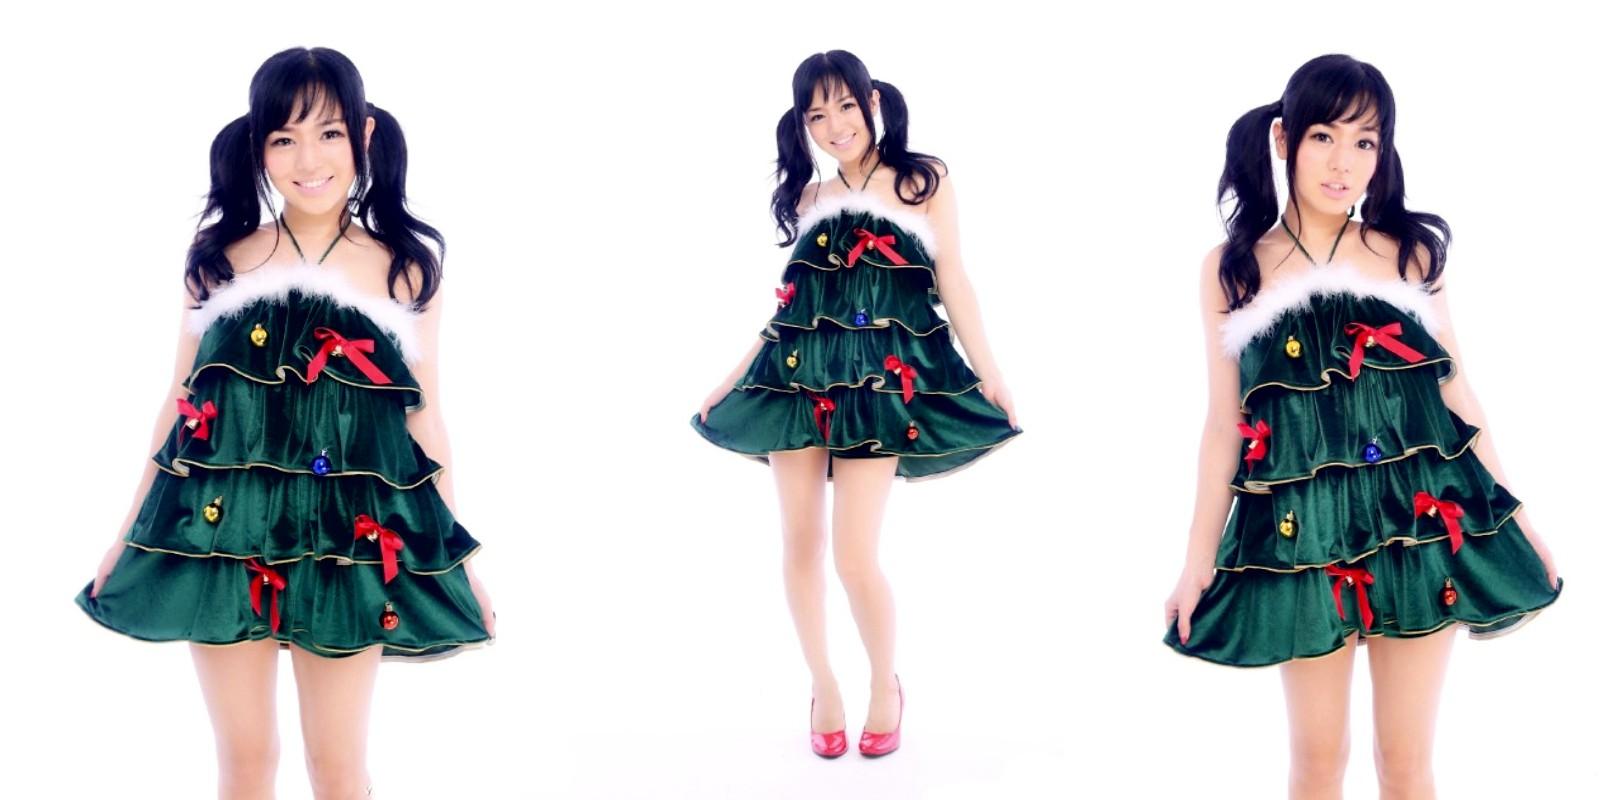 fae6e605b495 Kvinder asiatisk kjole mønster mode tøj design kostume kjole kostume design